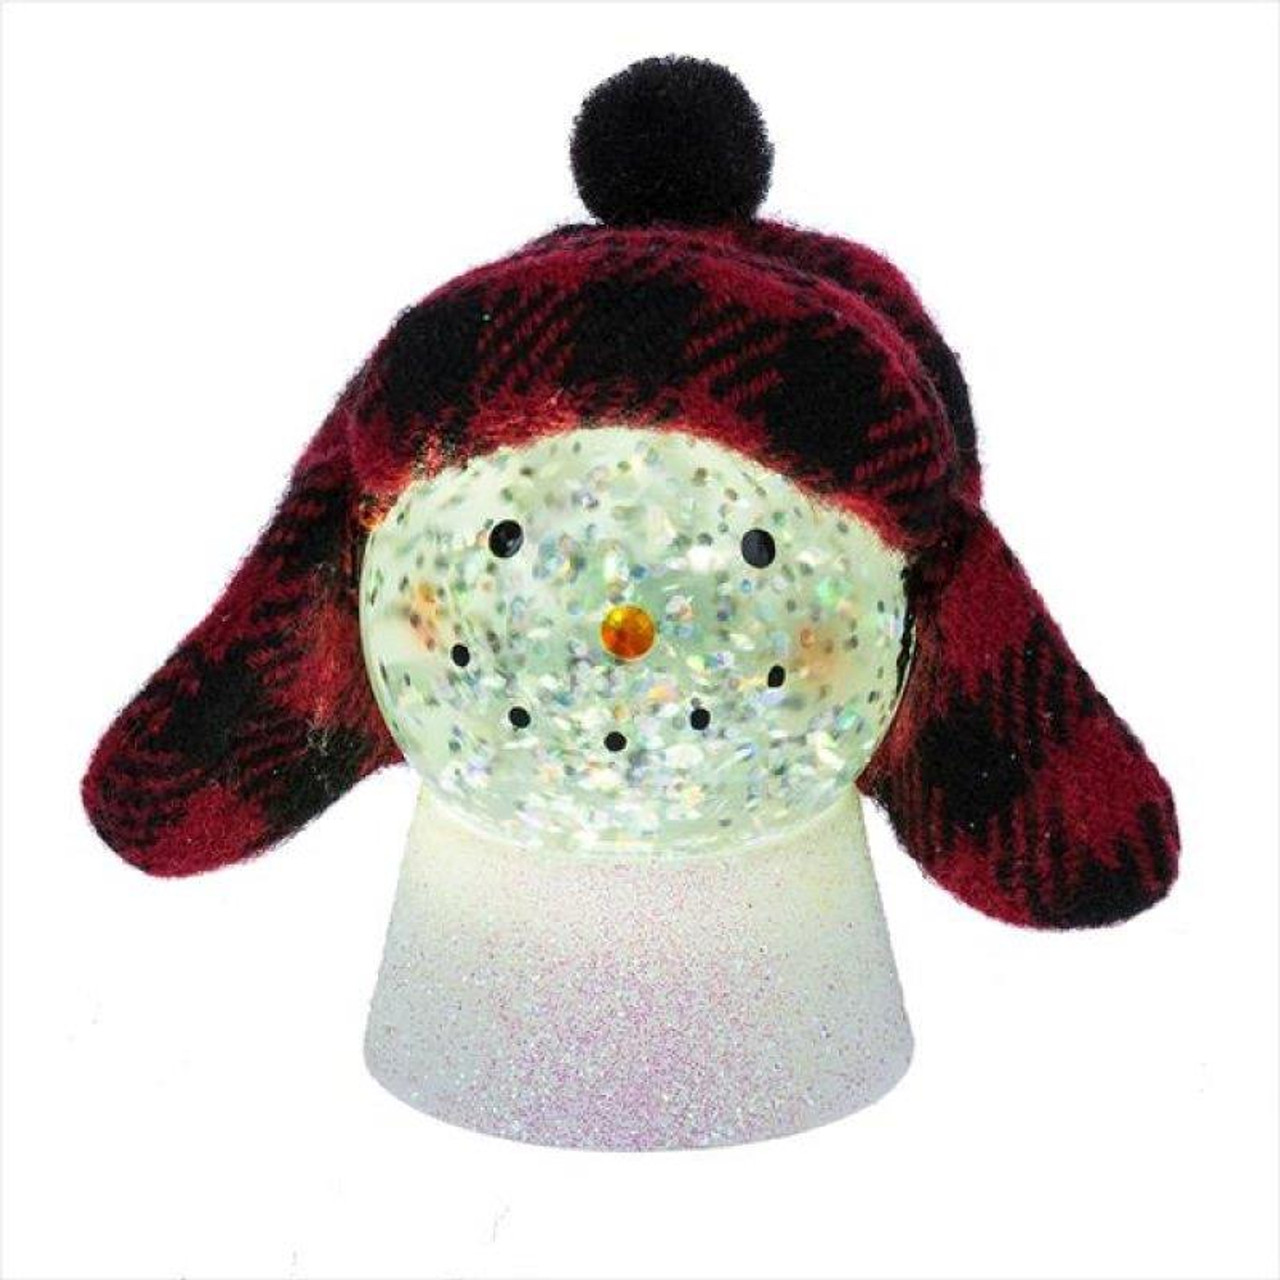 Midwest Cbk Lighted Led Hipster Snowman Mini Shimmer 151219